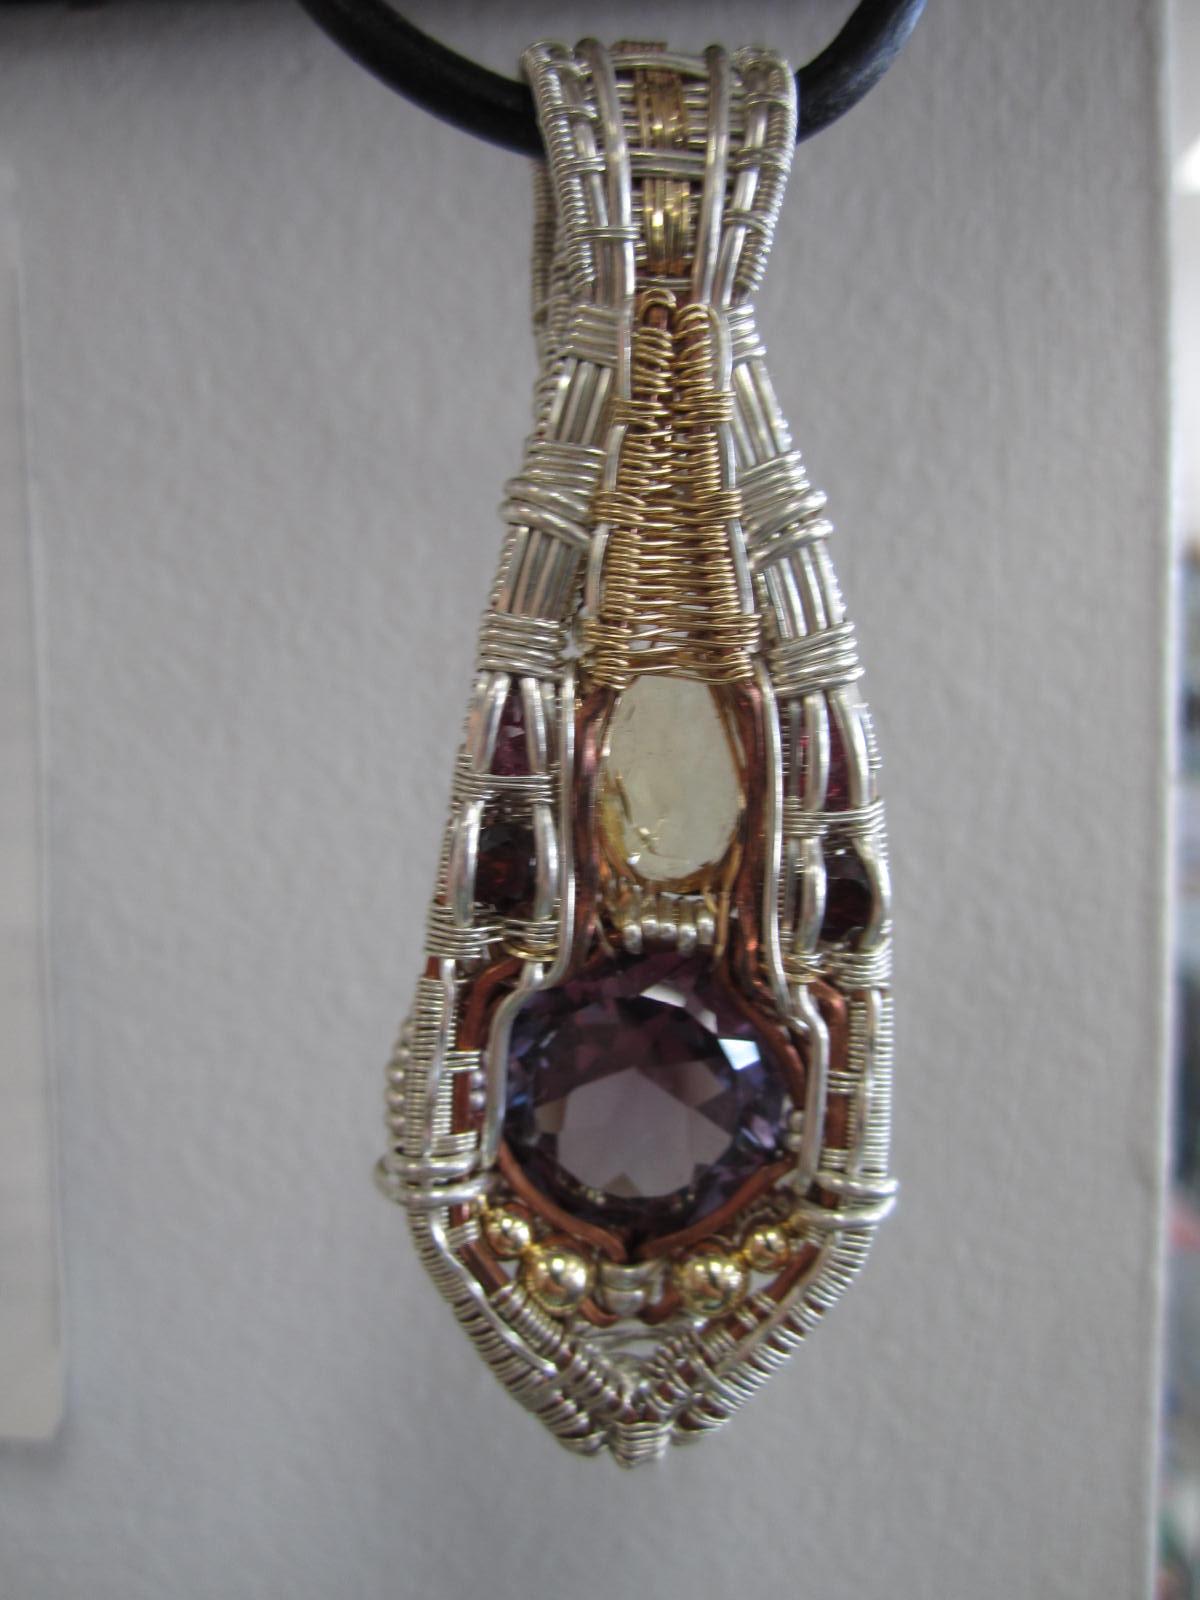 Wire wrap pendant alexandriterubygarnettopaz wire wrap pendant mozeypictures Image collections